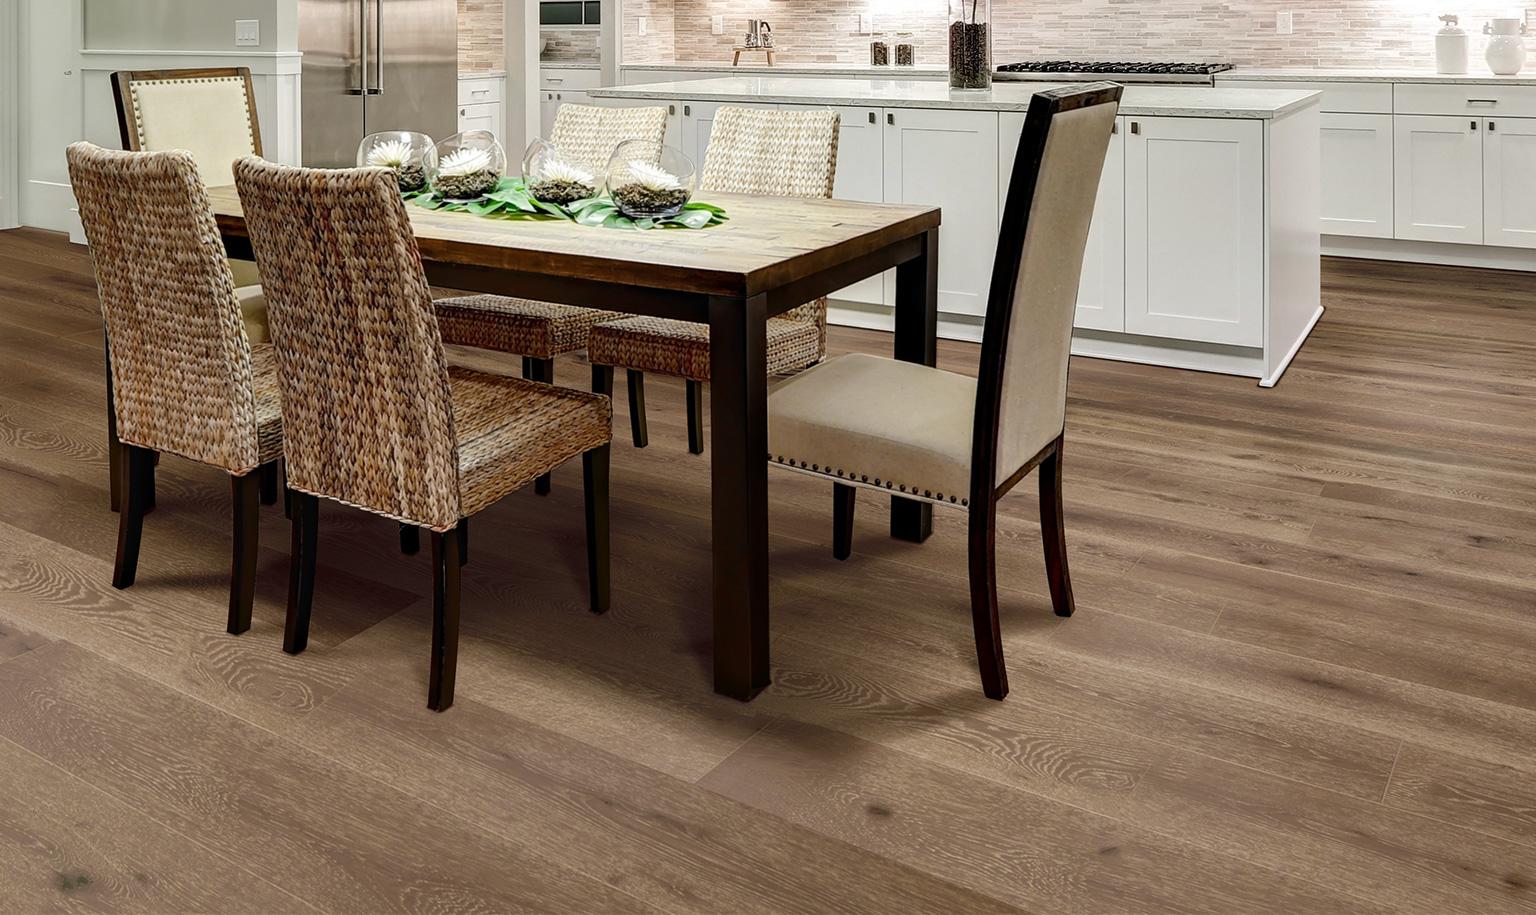 Best Calabria White Oak Hardwood Floors Smoked Engineered 400 x 300